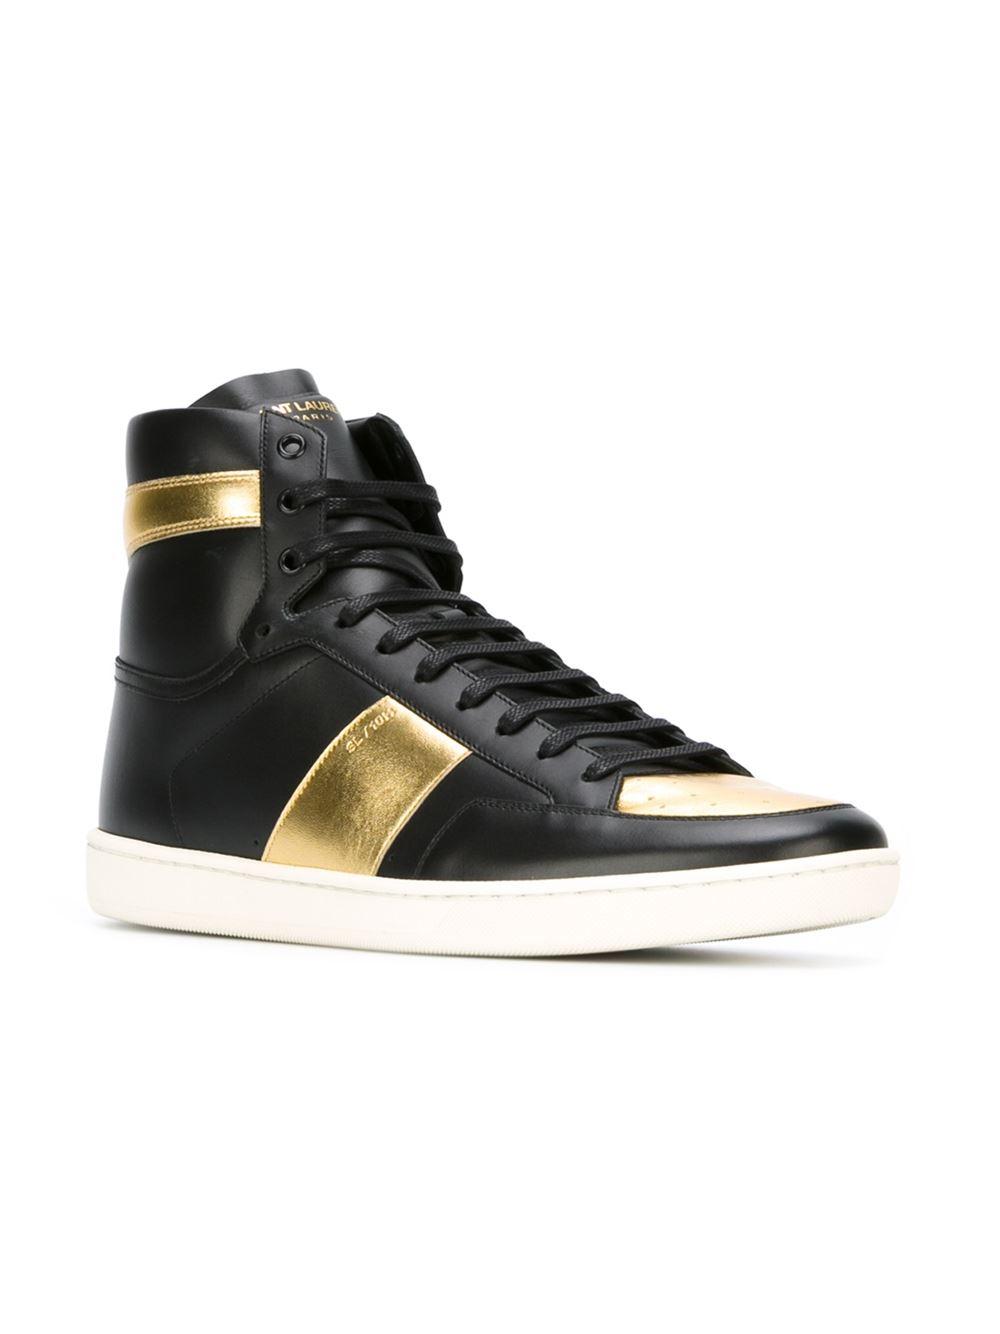 st_laurent_shoe1.jpg